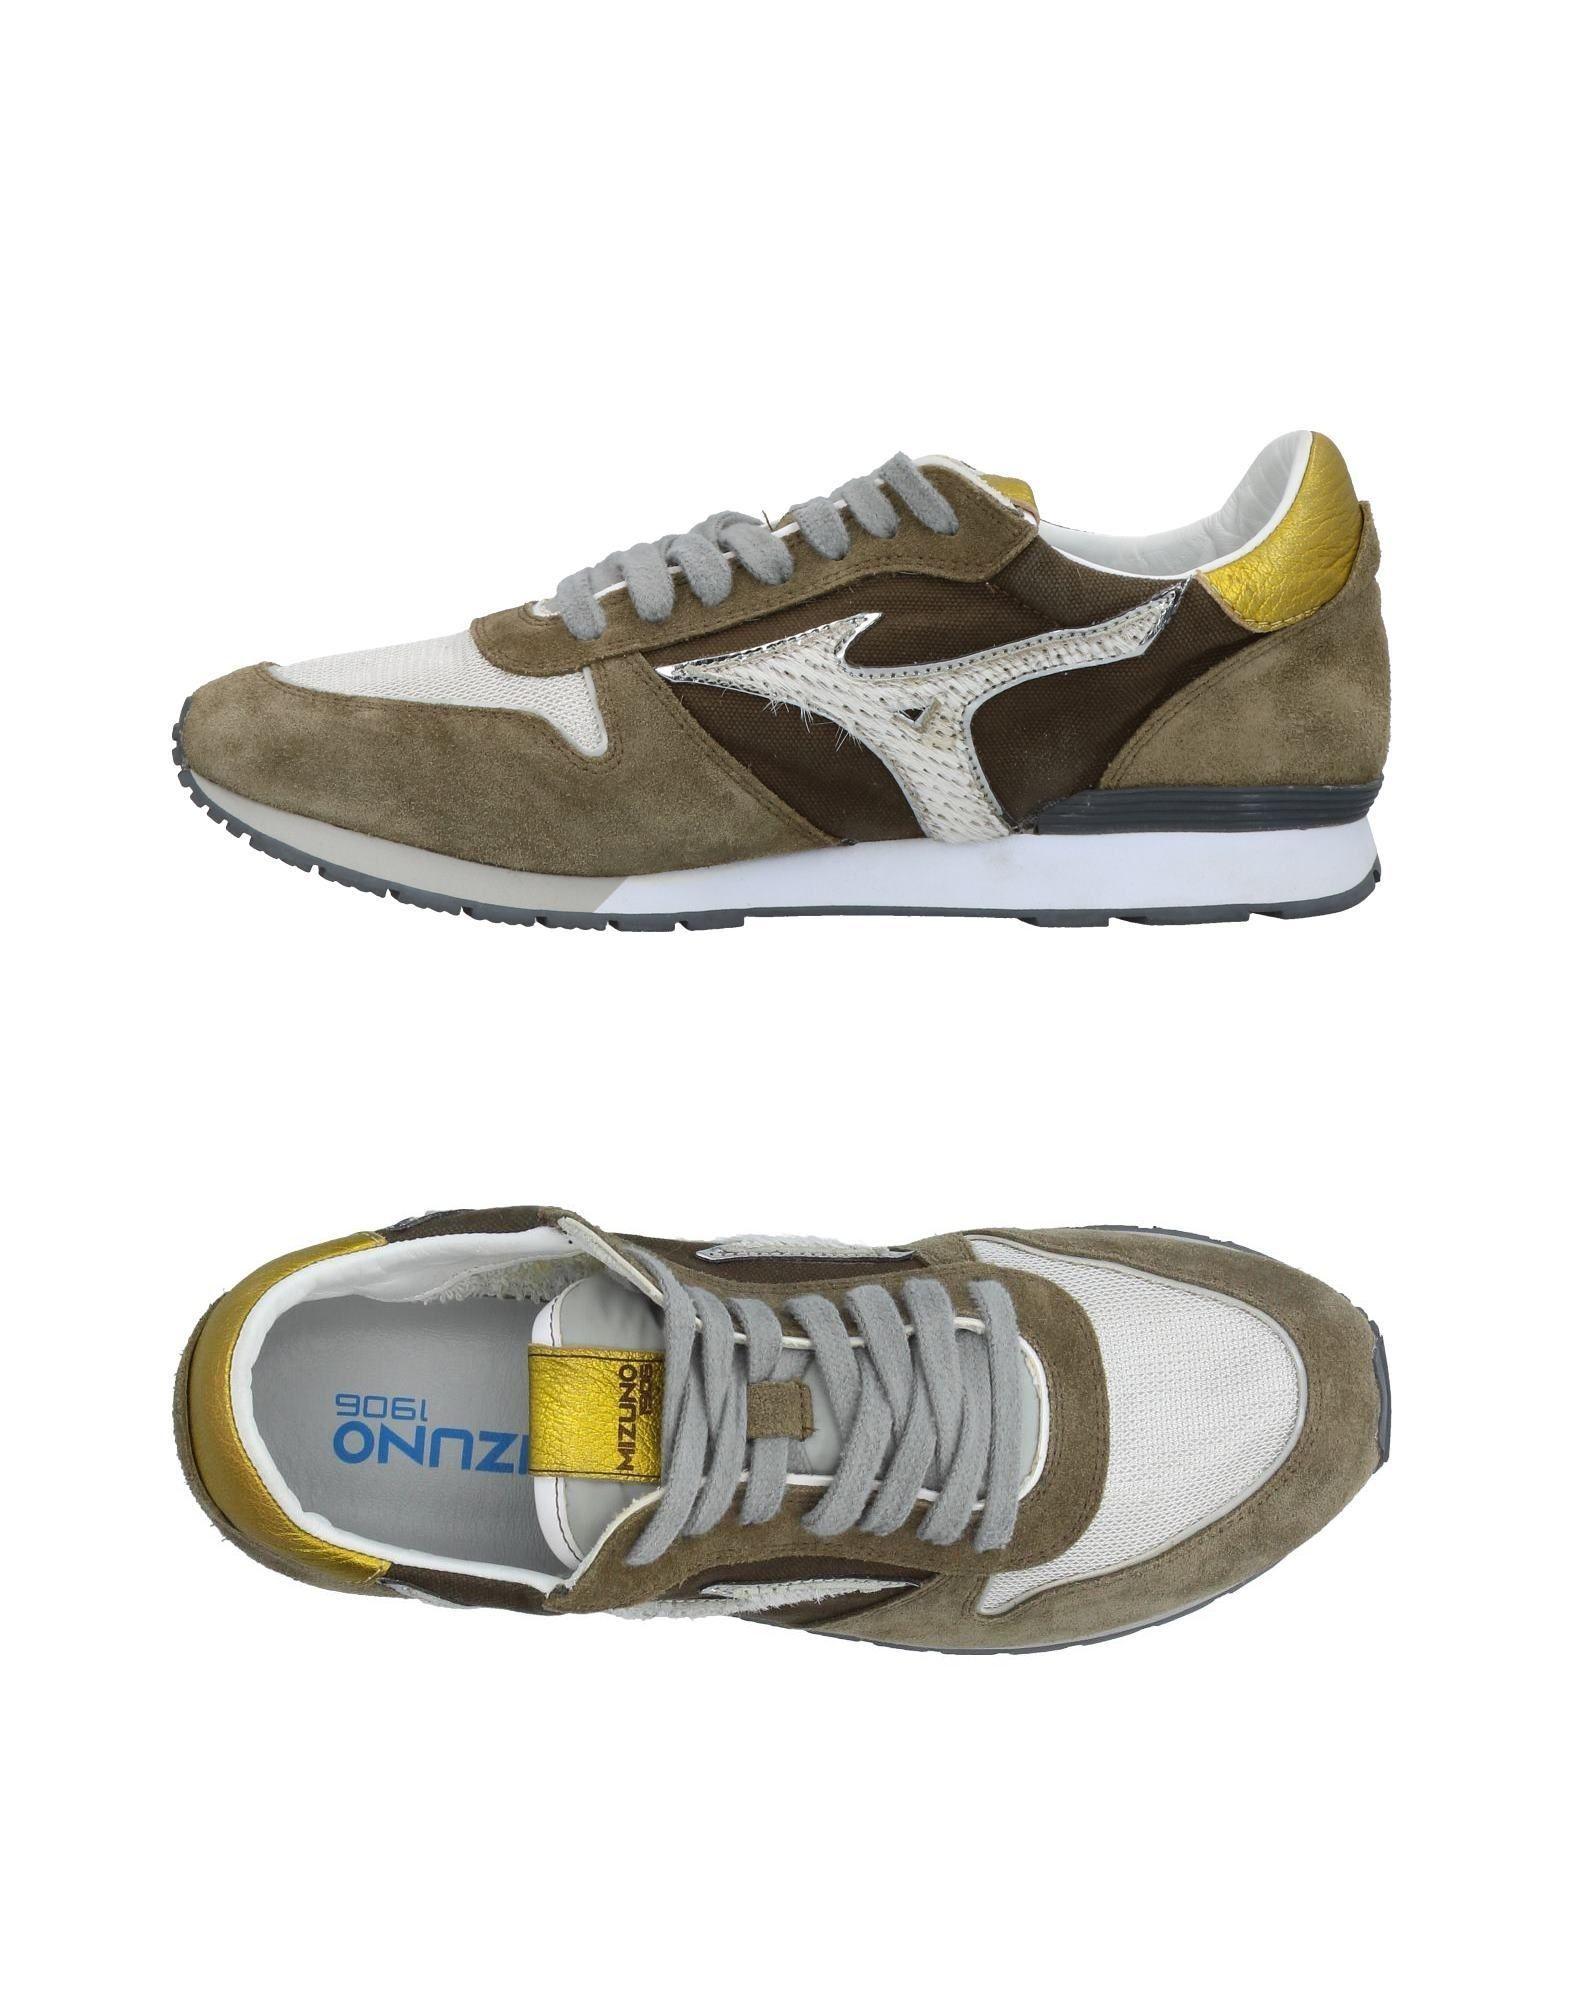 mens mizuno running shoes size 9.5 in uk military